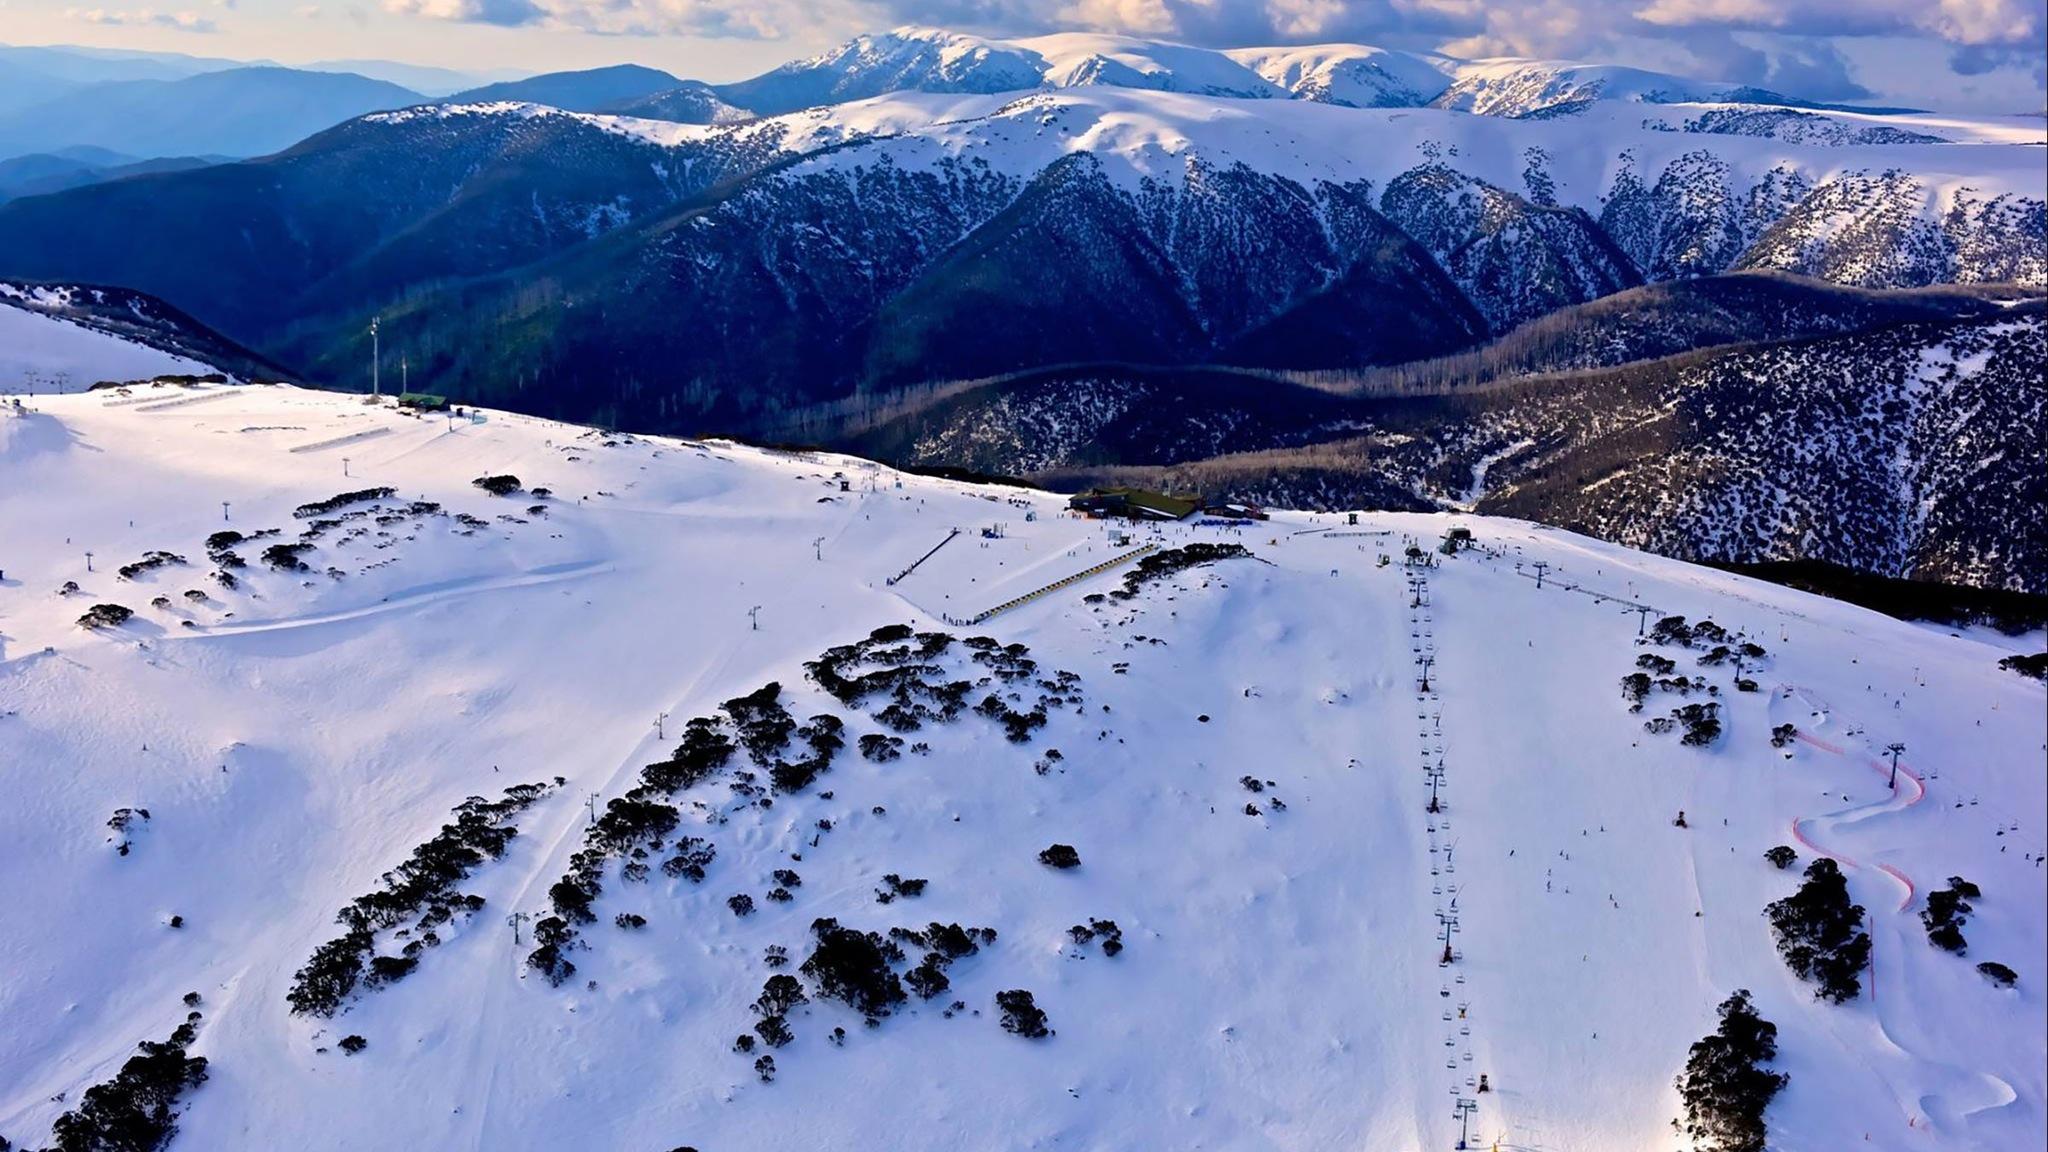 falls creek all season alpine resort, attraction, high country